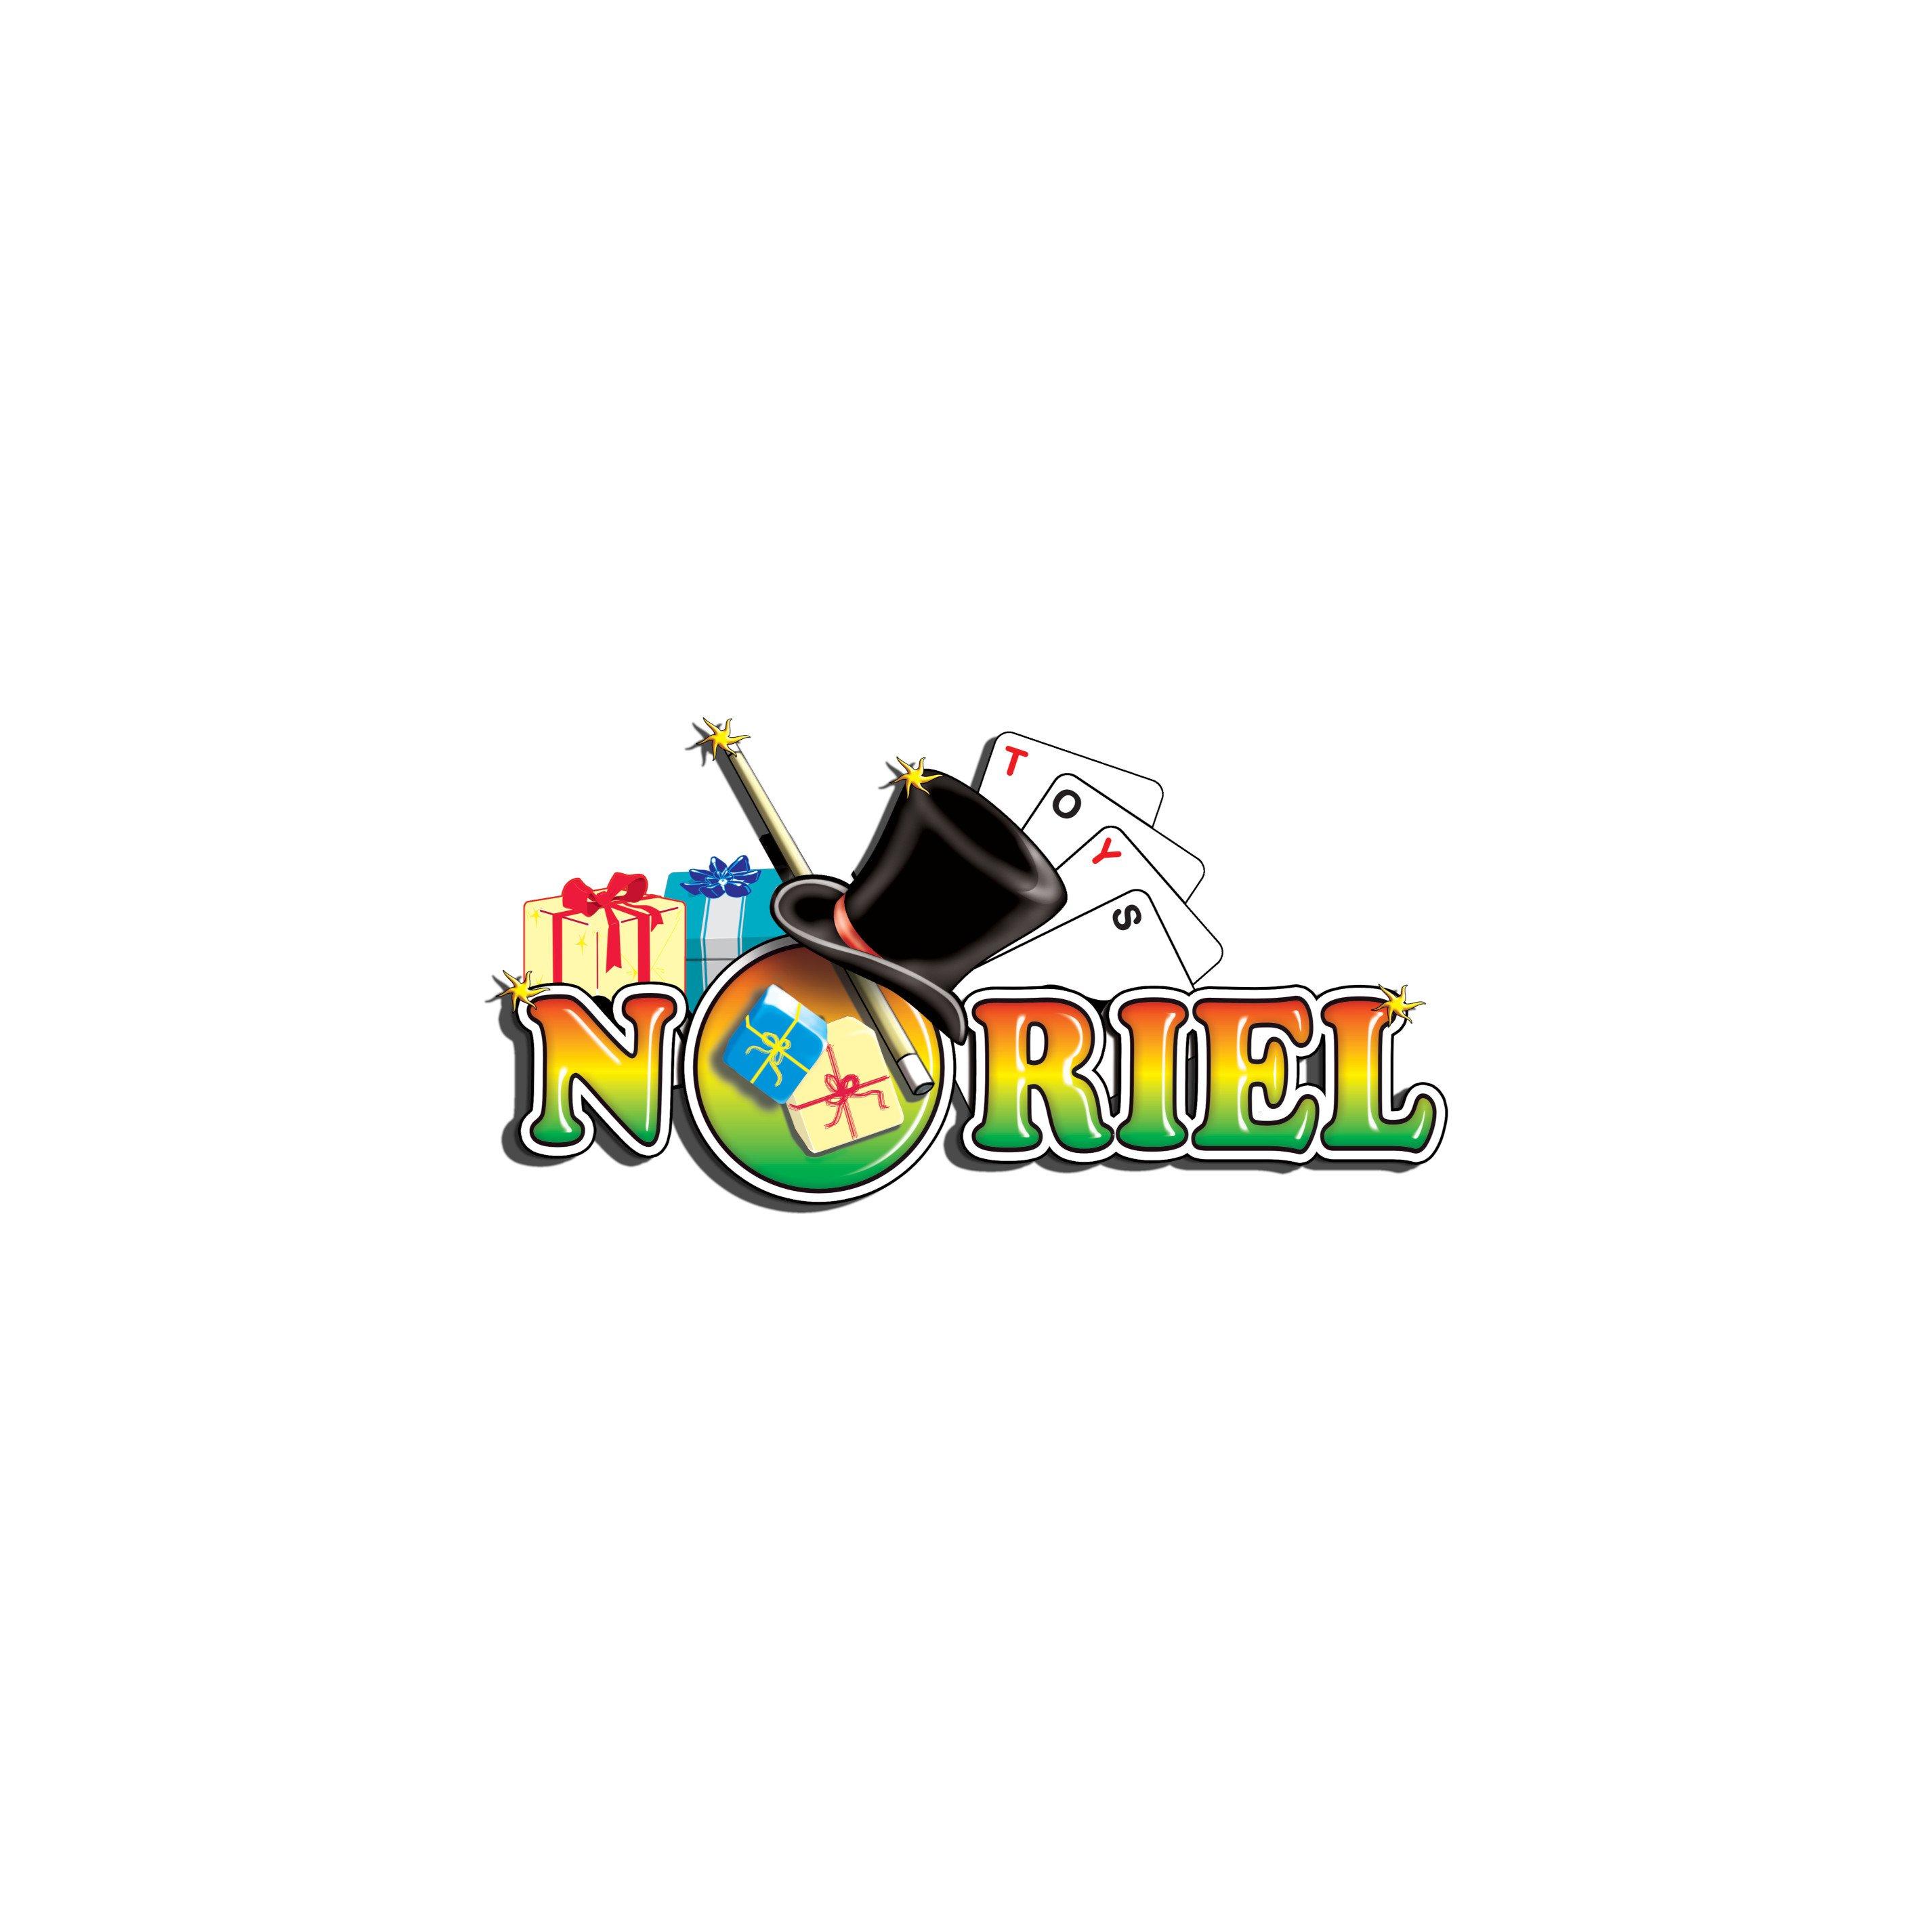 Girasol - Colorati cu abtibilduri 4 - Imagini din povesti